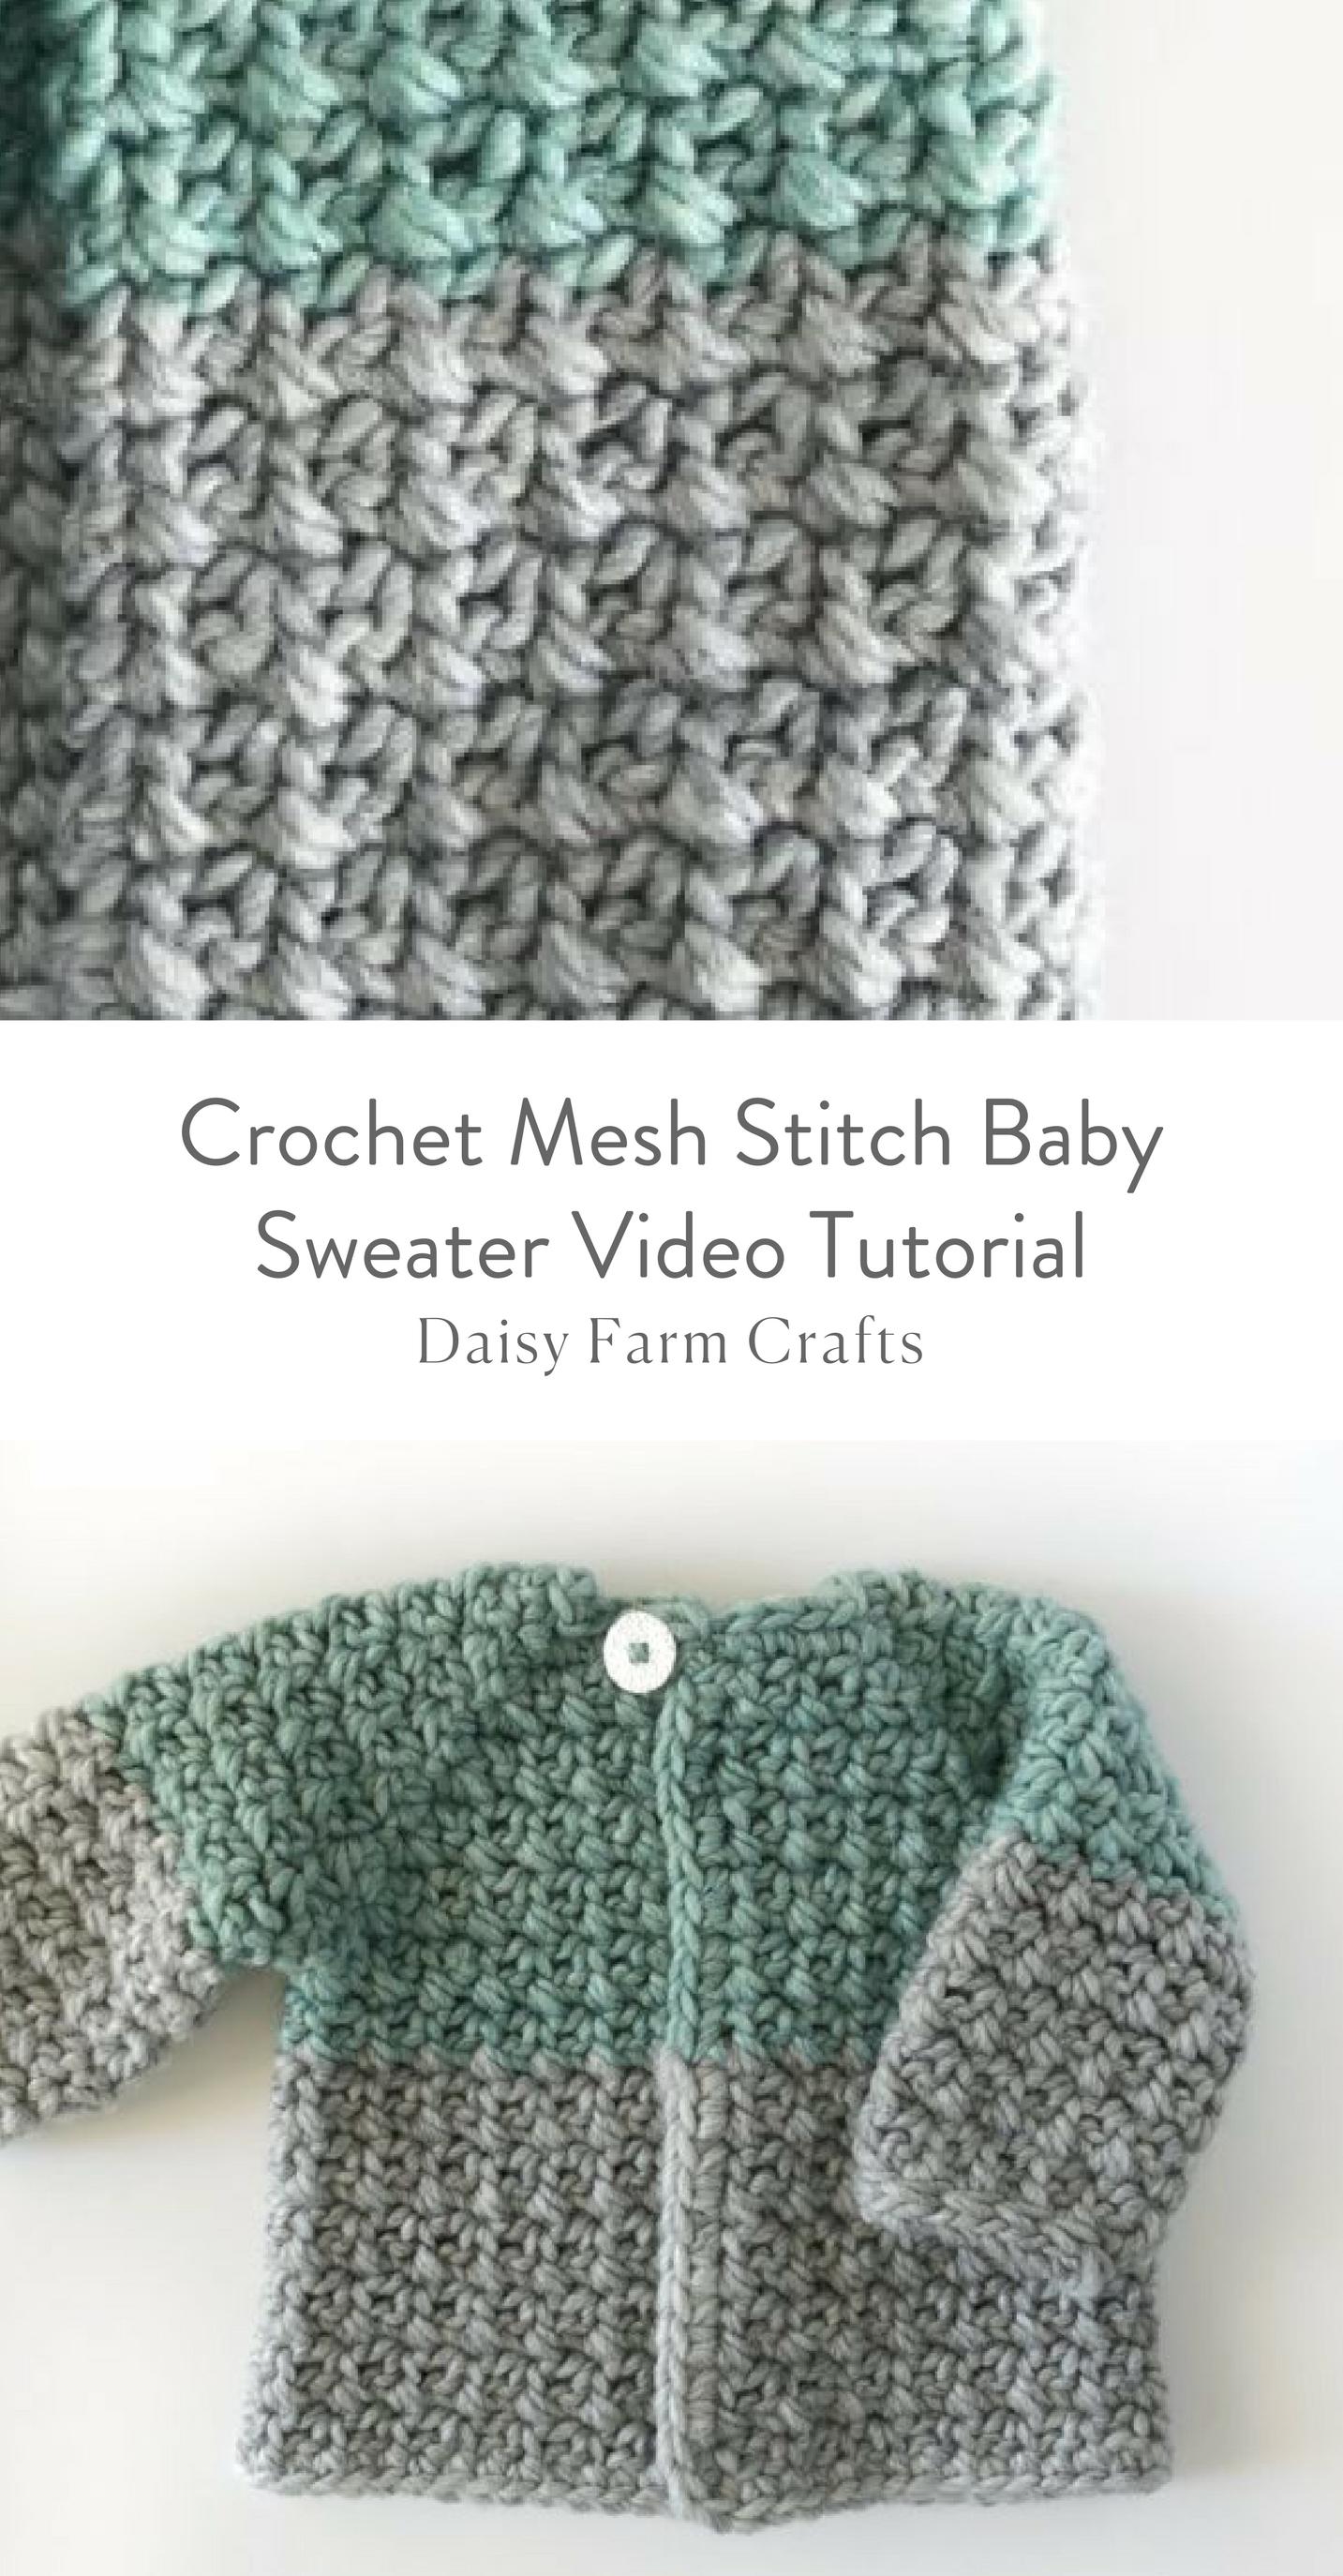 Crochet Mesh Stitch Baby Sweater Video Tutorial   soon   Pinterest